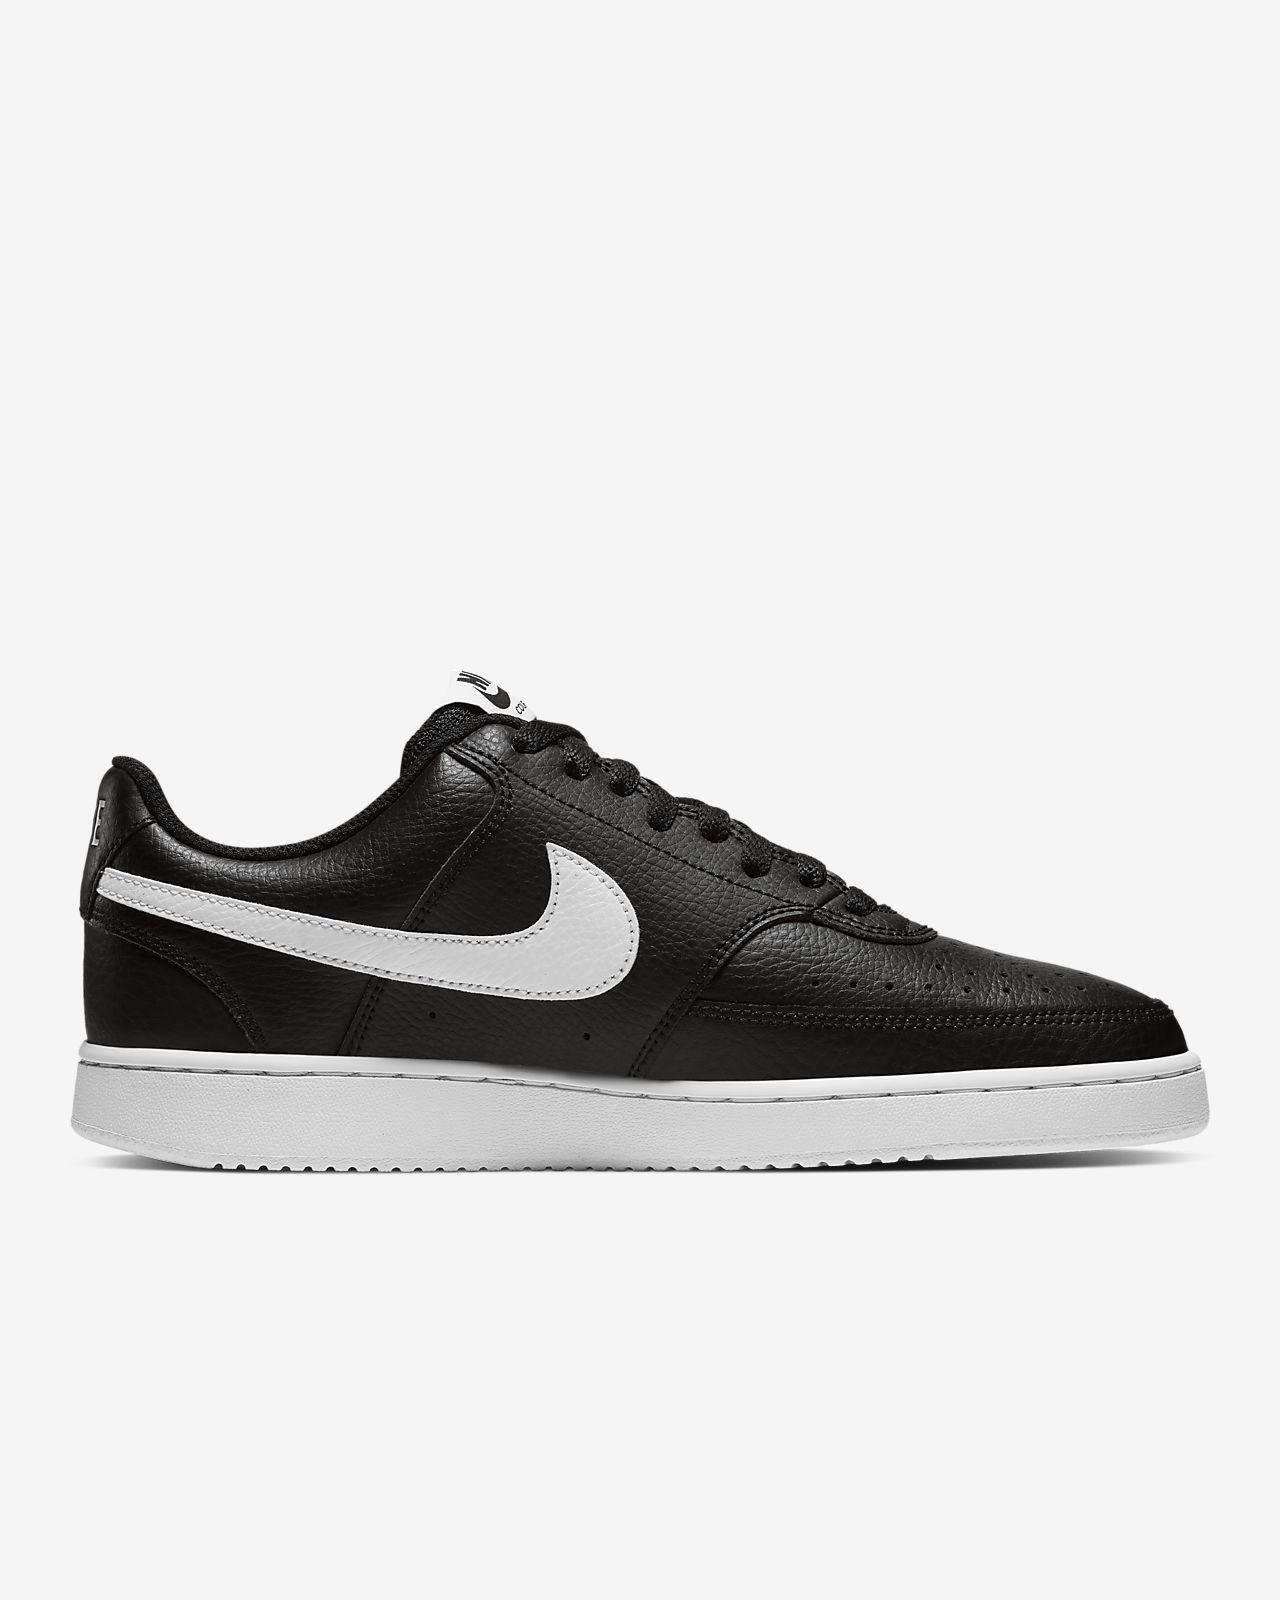 Sapatilhas NikeCourt Vision Low para homem